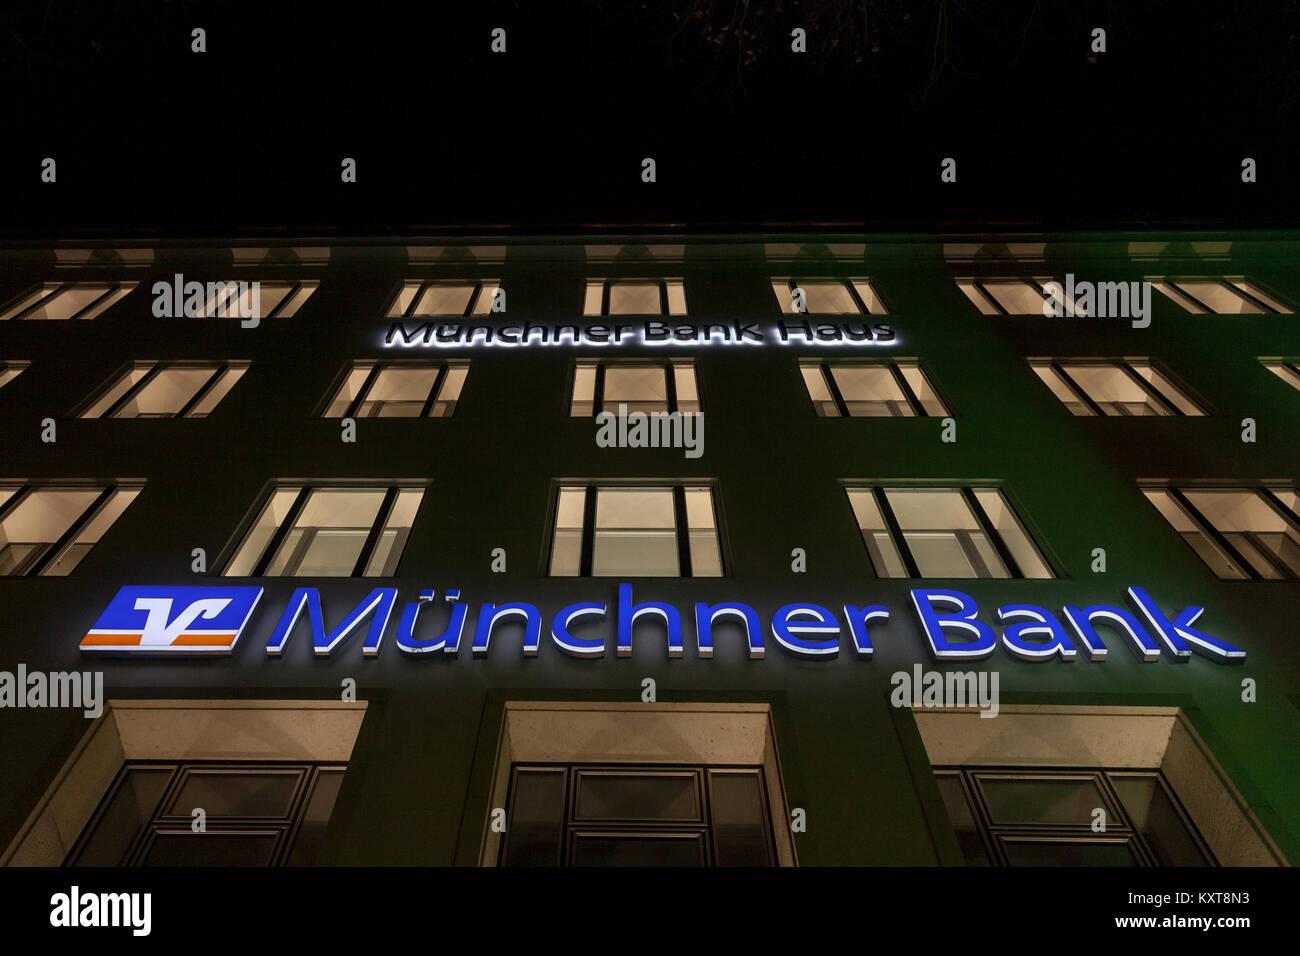 MUNICH, GERMANY - DECEMBER 17, 2017: Munchner Bank logo on their Munich main office (Munchner Bank Haus) taken at - Stock Image